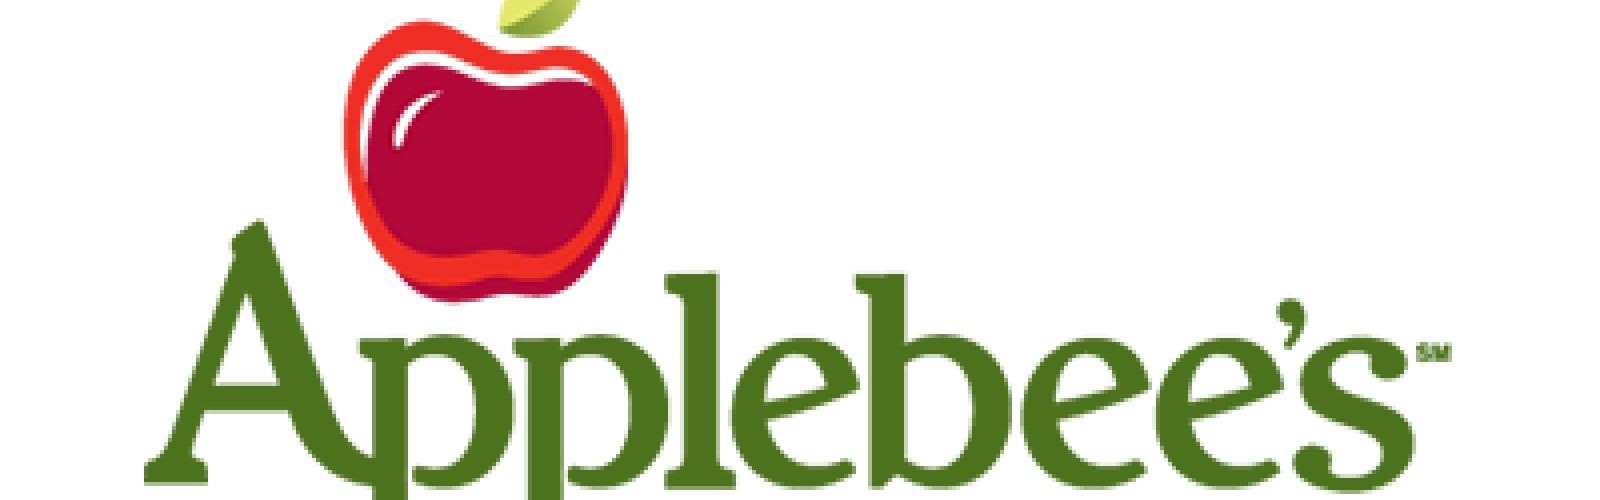 Applebee 's Neighborhood Grill